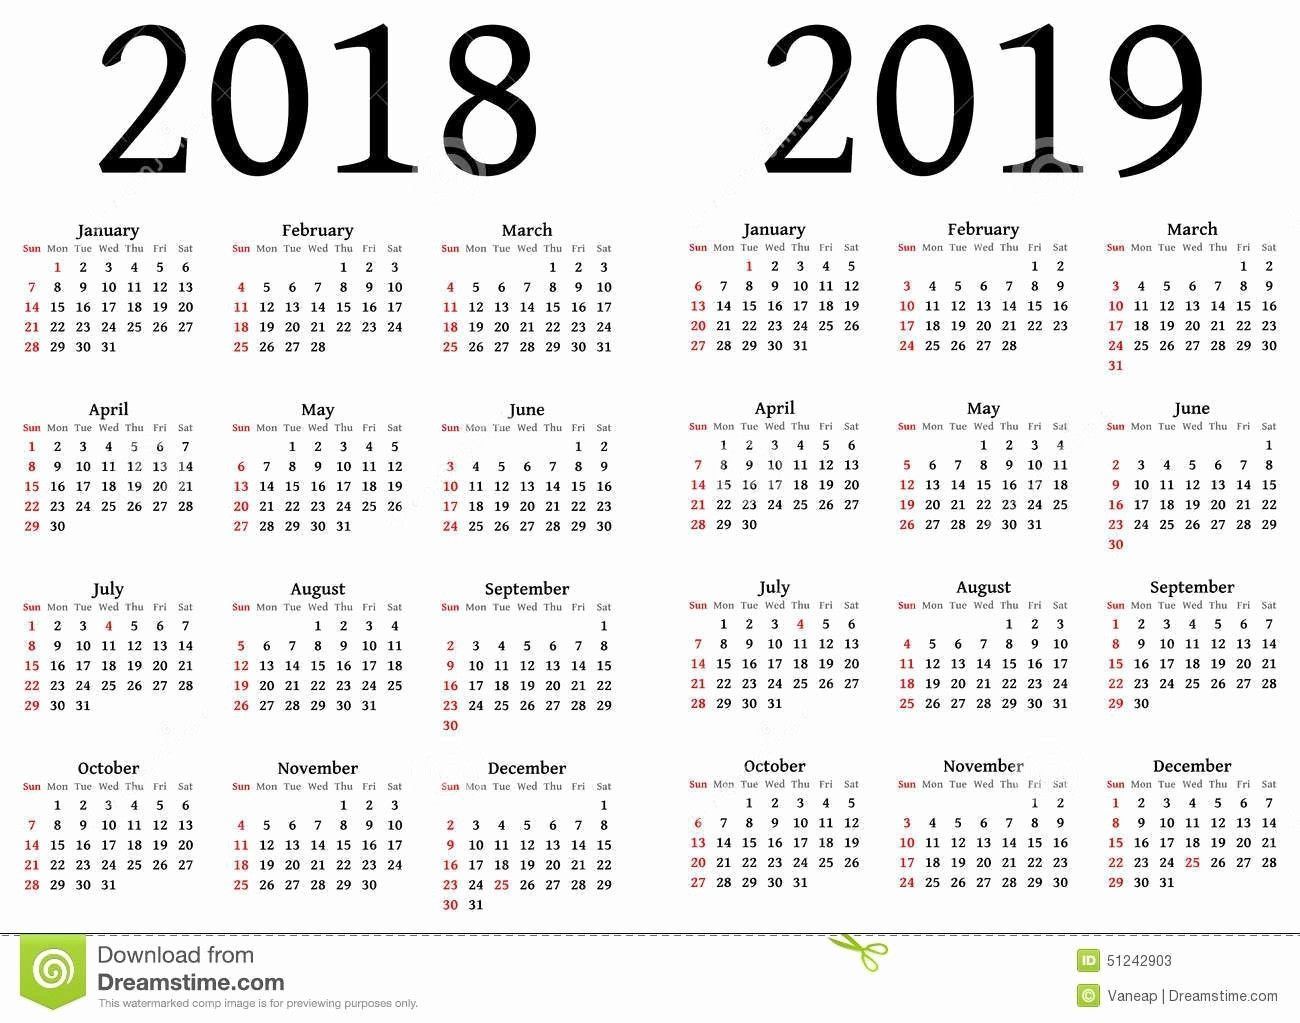 2019 Biweekly Payroll Calendar Calculator Payroll Calendar 2019